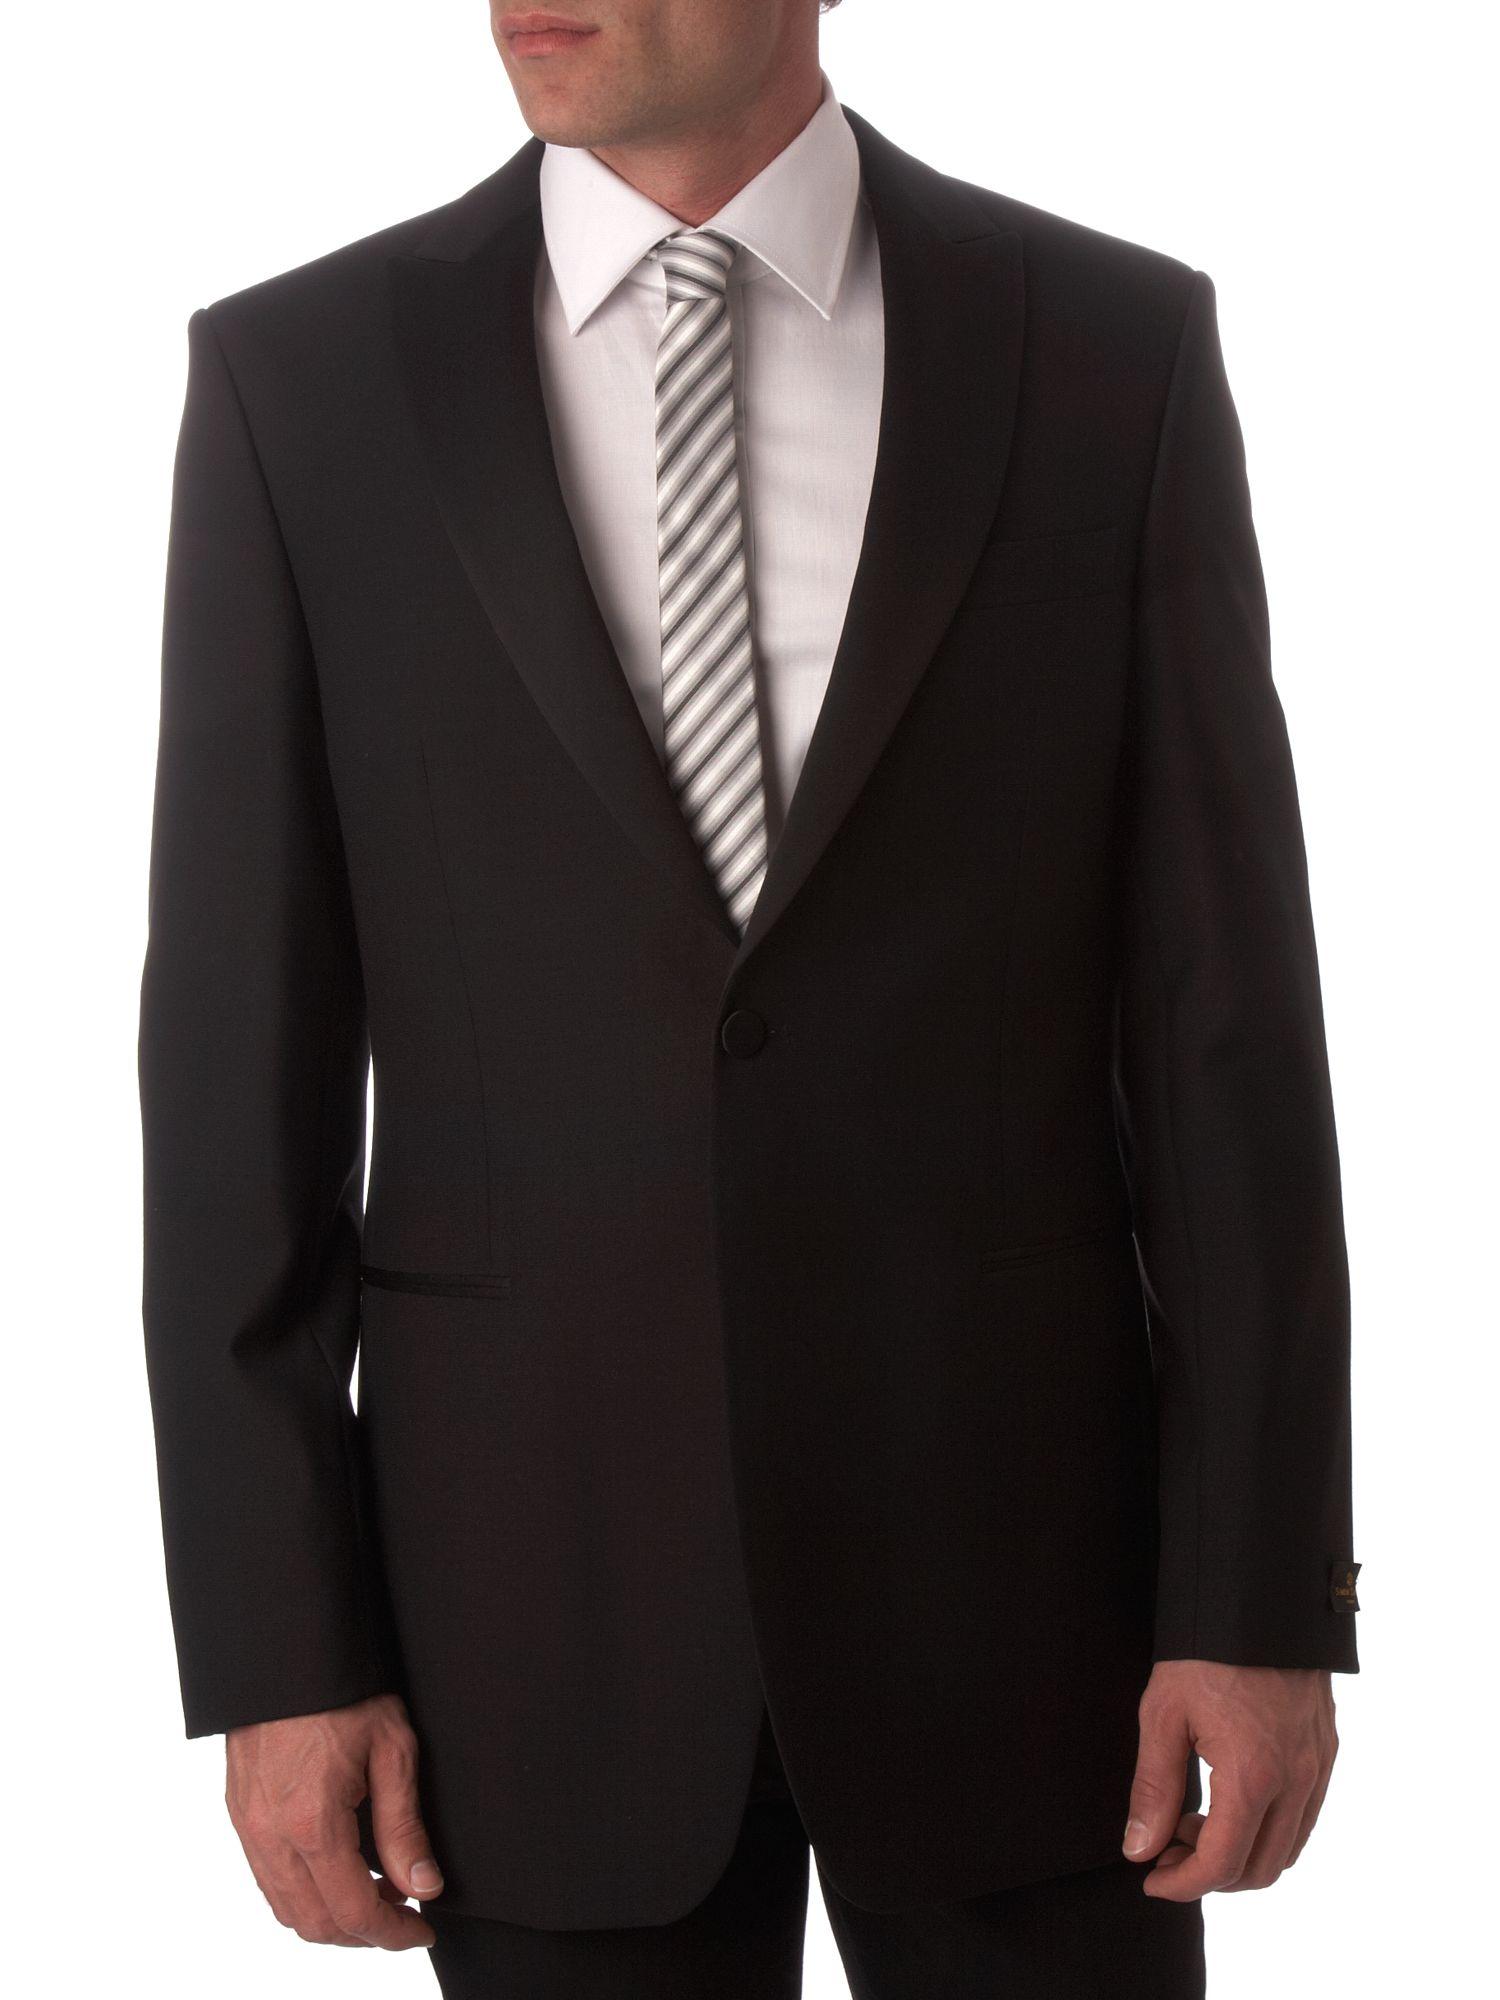 Find great deals on eBay for mens formal dinner jacket. Shop with confidence.